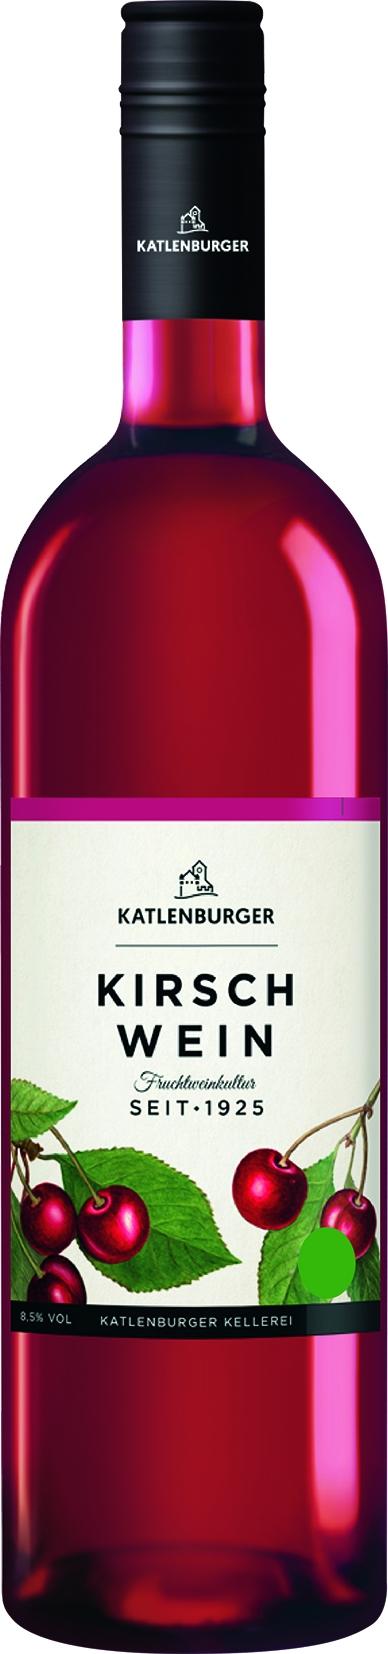 Katlenburger Kirschwein